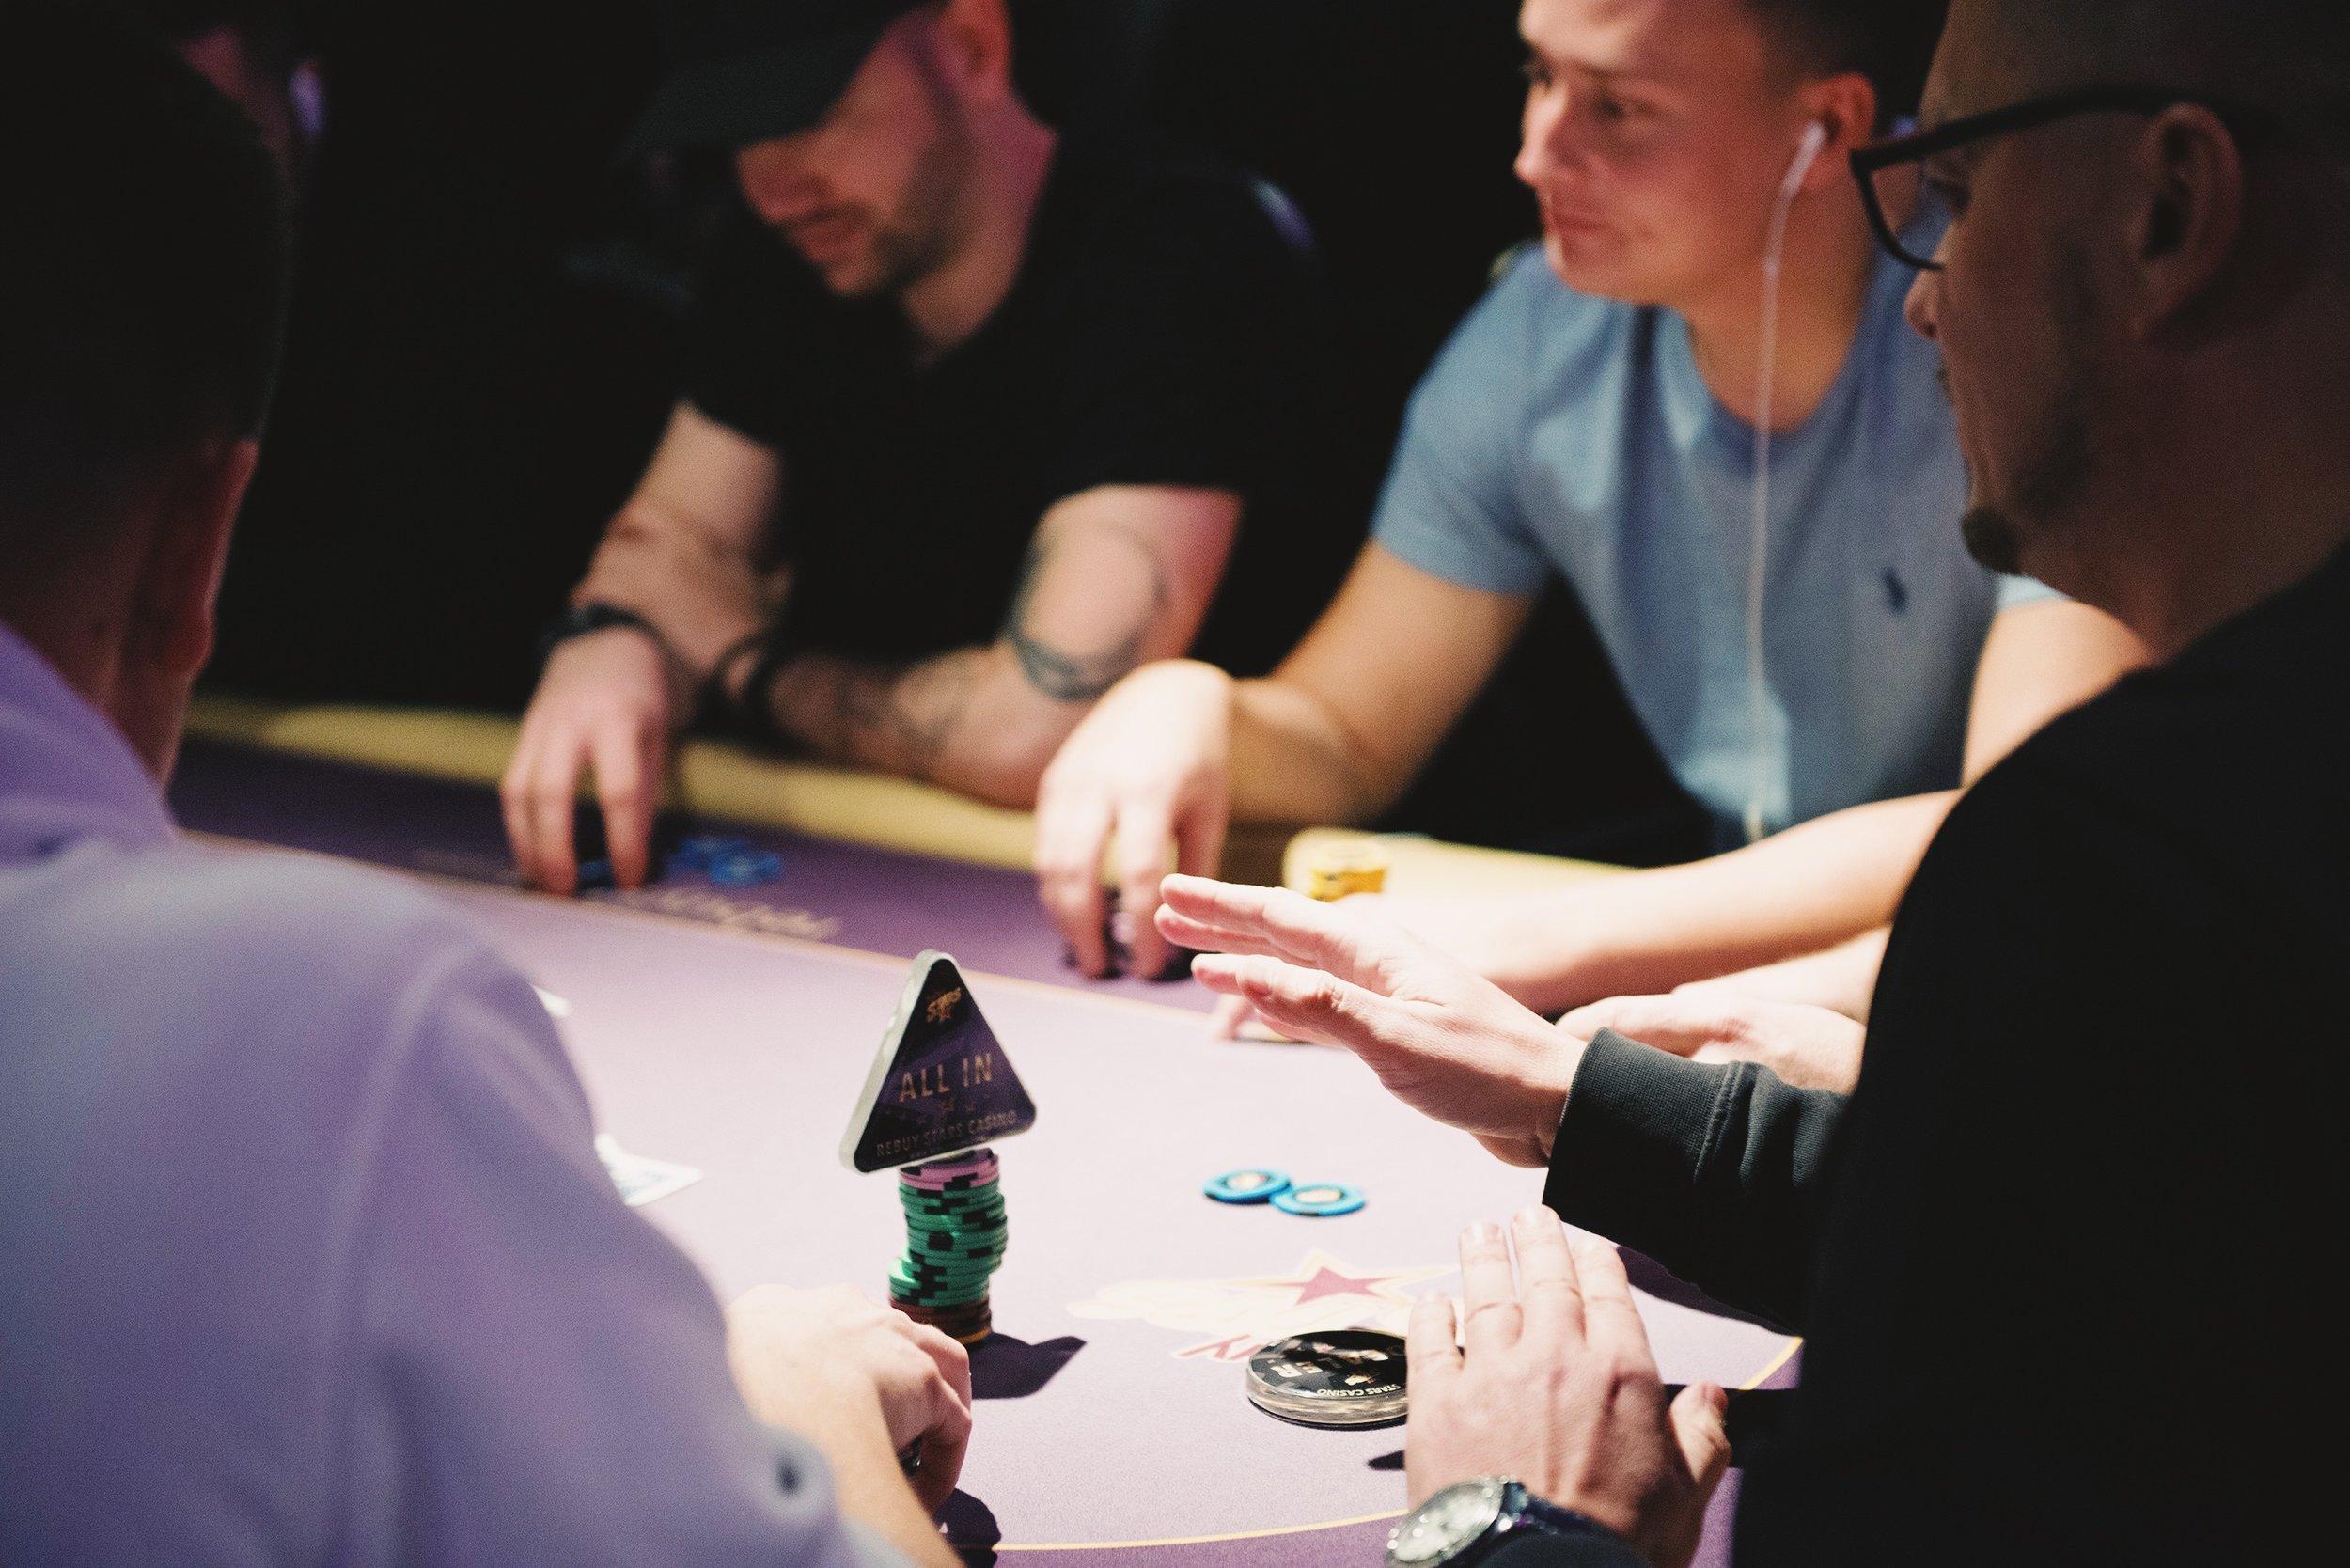 Poker-Photography-Europe-Polina-Shubkina-Casino-RebuyStars-002.JPG